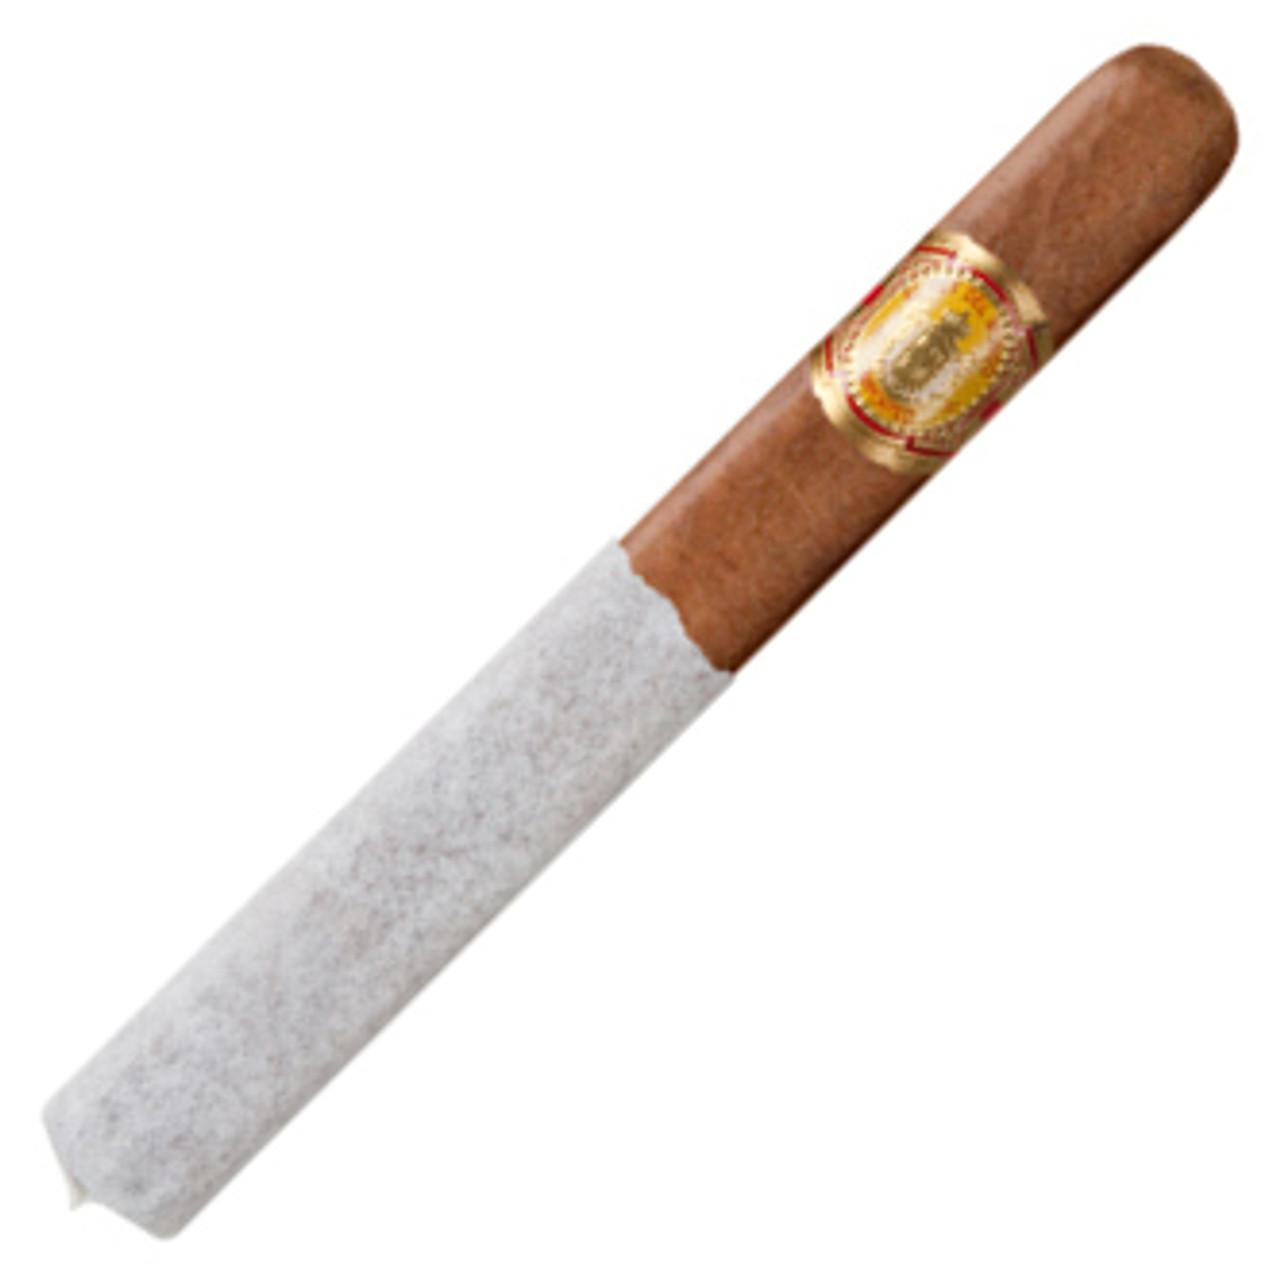 El Rey Del Mundo Rectangulare Cigars - 5.62 X 45 (Box of 30)